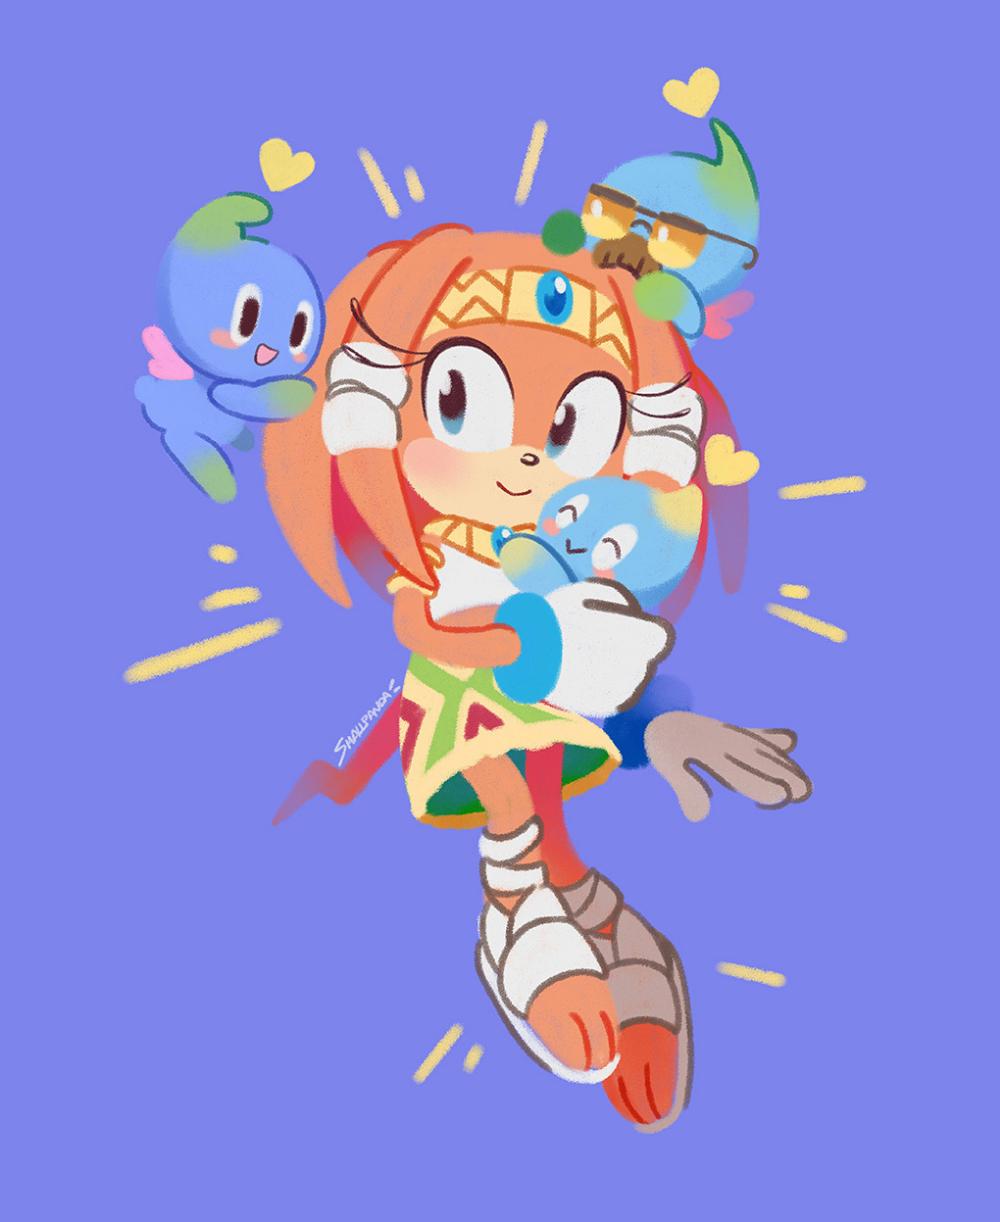 Tikal The Echidna 0smallpanda0 Ray Of Light In 2020 Sonic Fan Characters Echidna Tikal